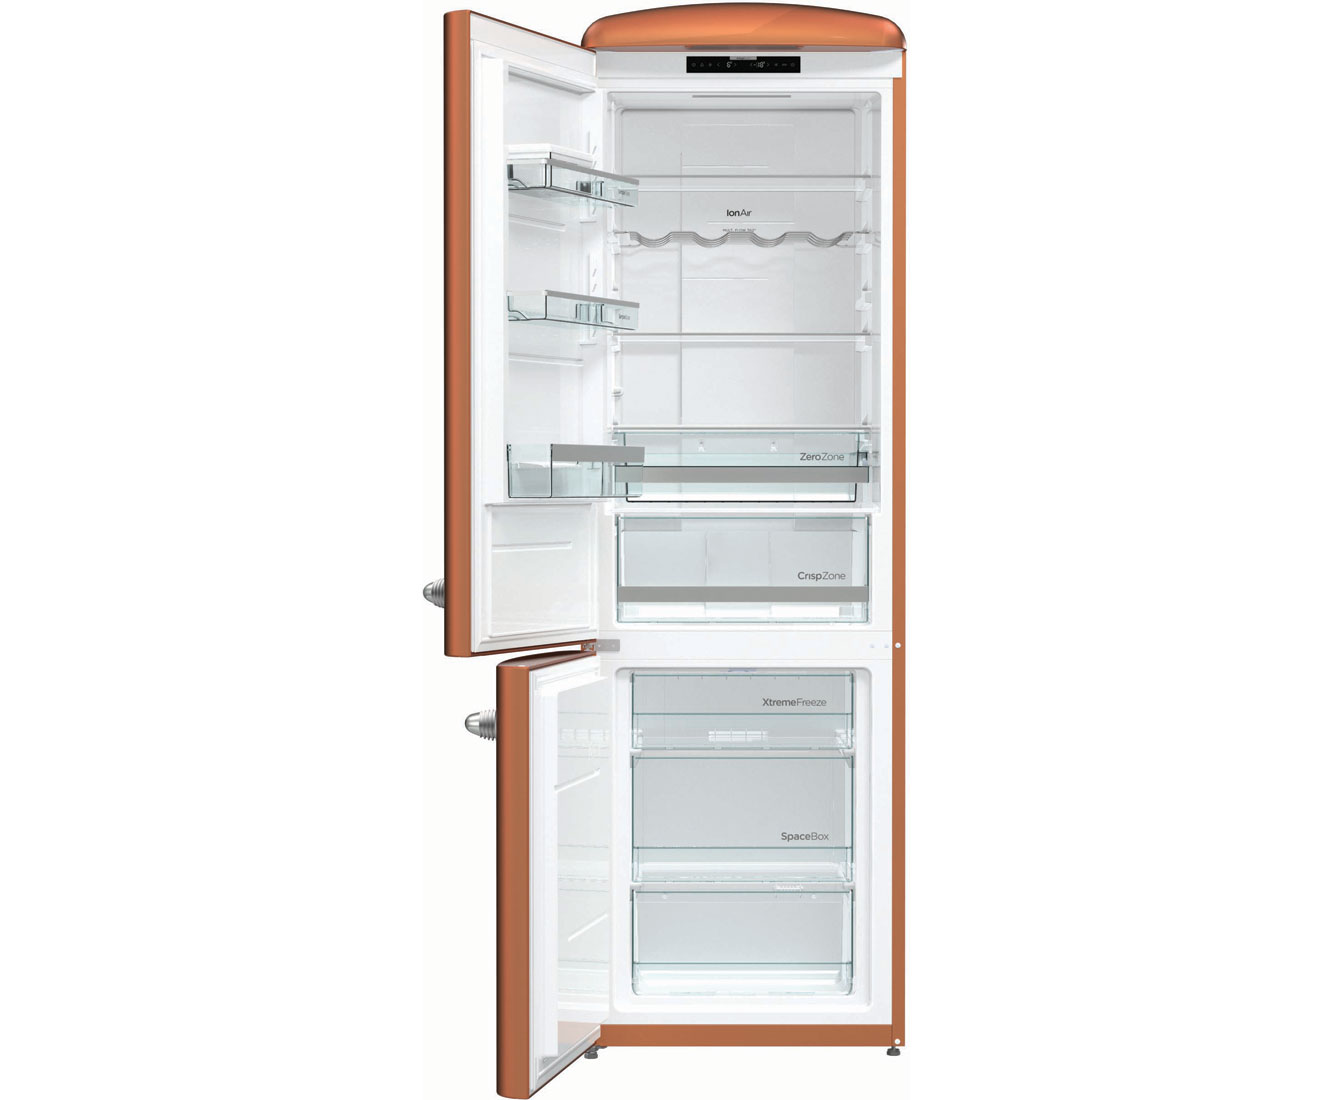 Gorenje Kühlschrank Kombi : Rabatt preisvergleich.de weiße ware u003e kühlen gefrieren u003e kühl